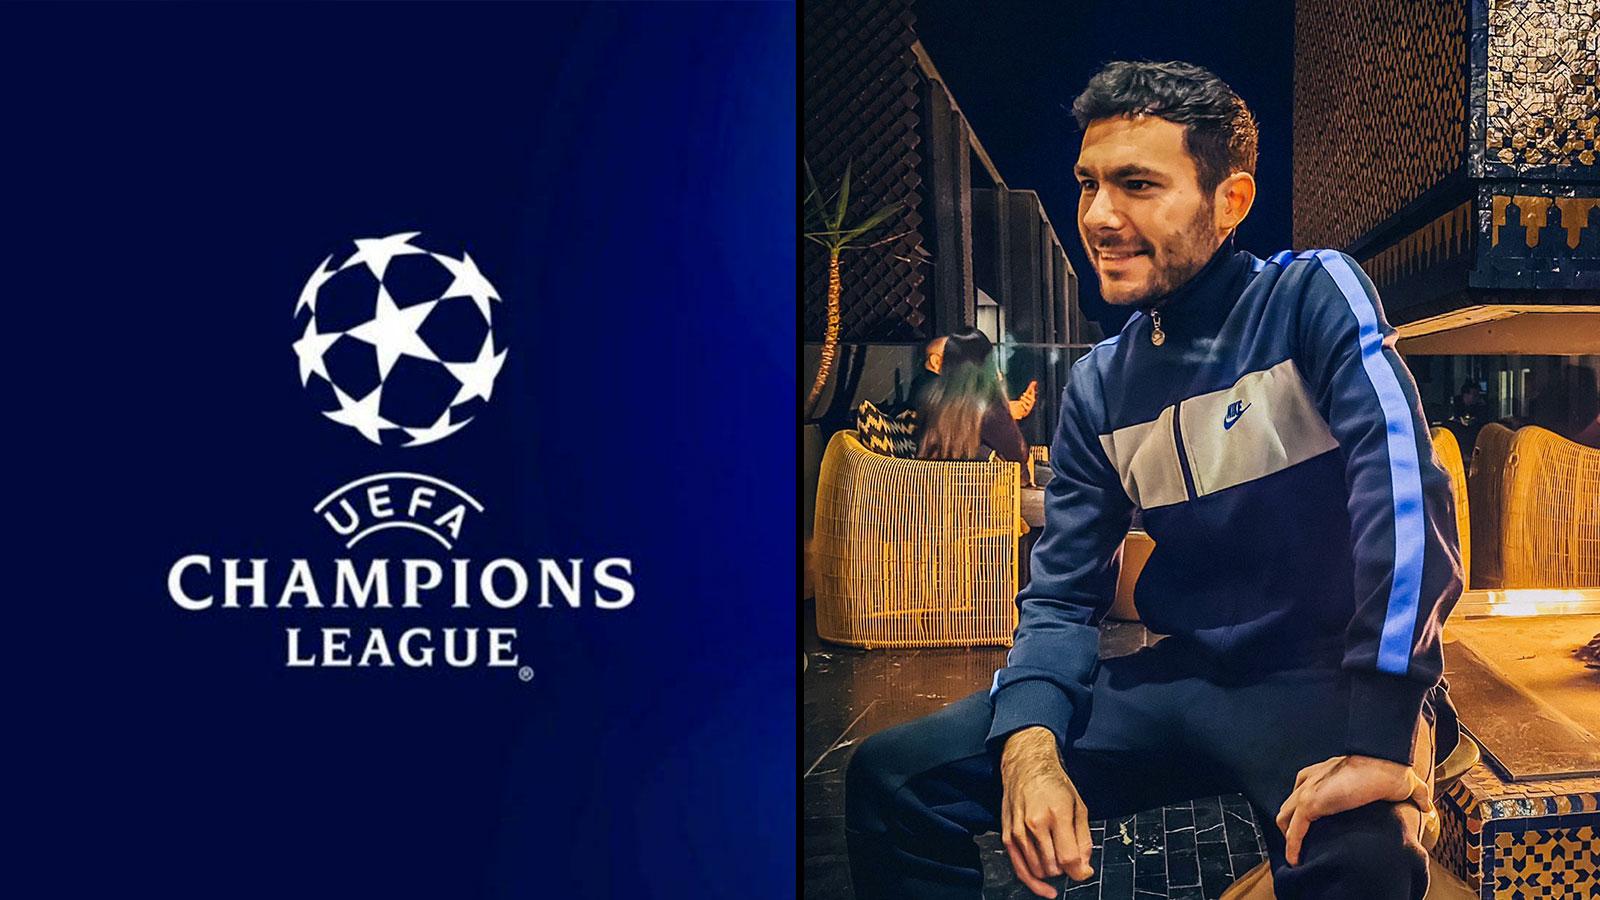 UEFA / Twitter : @BruceGrannec